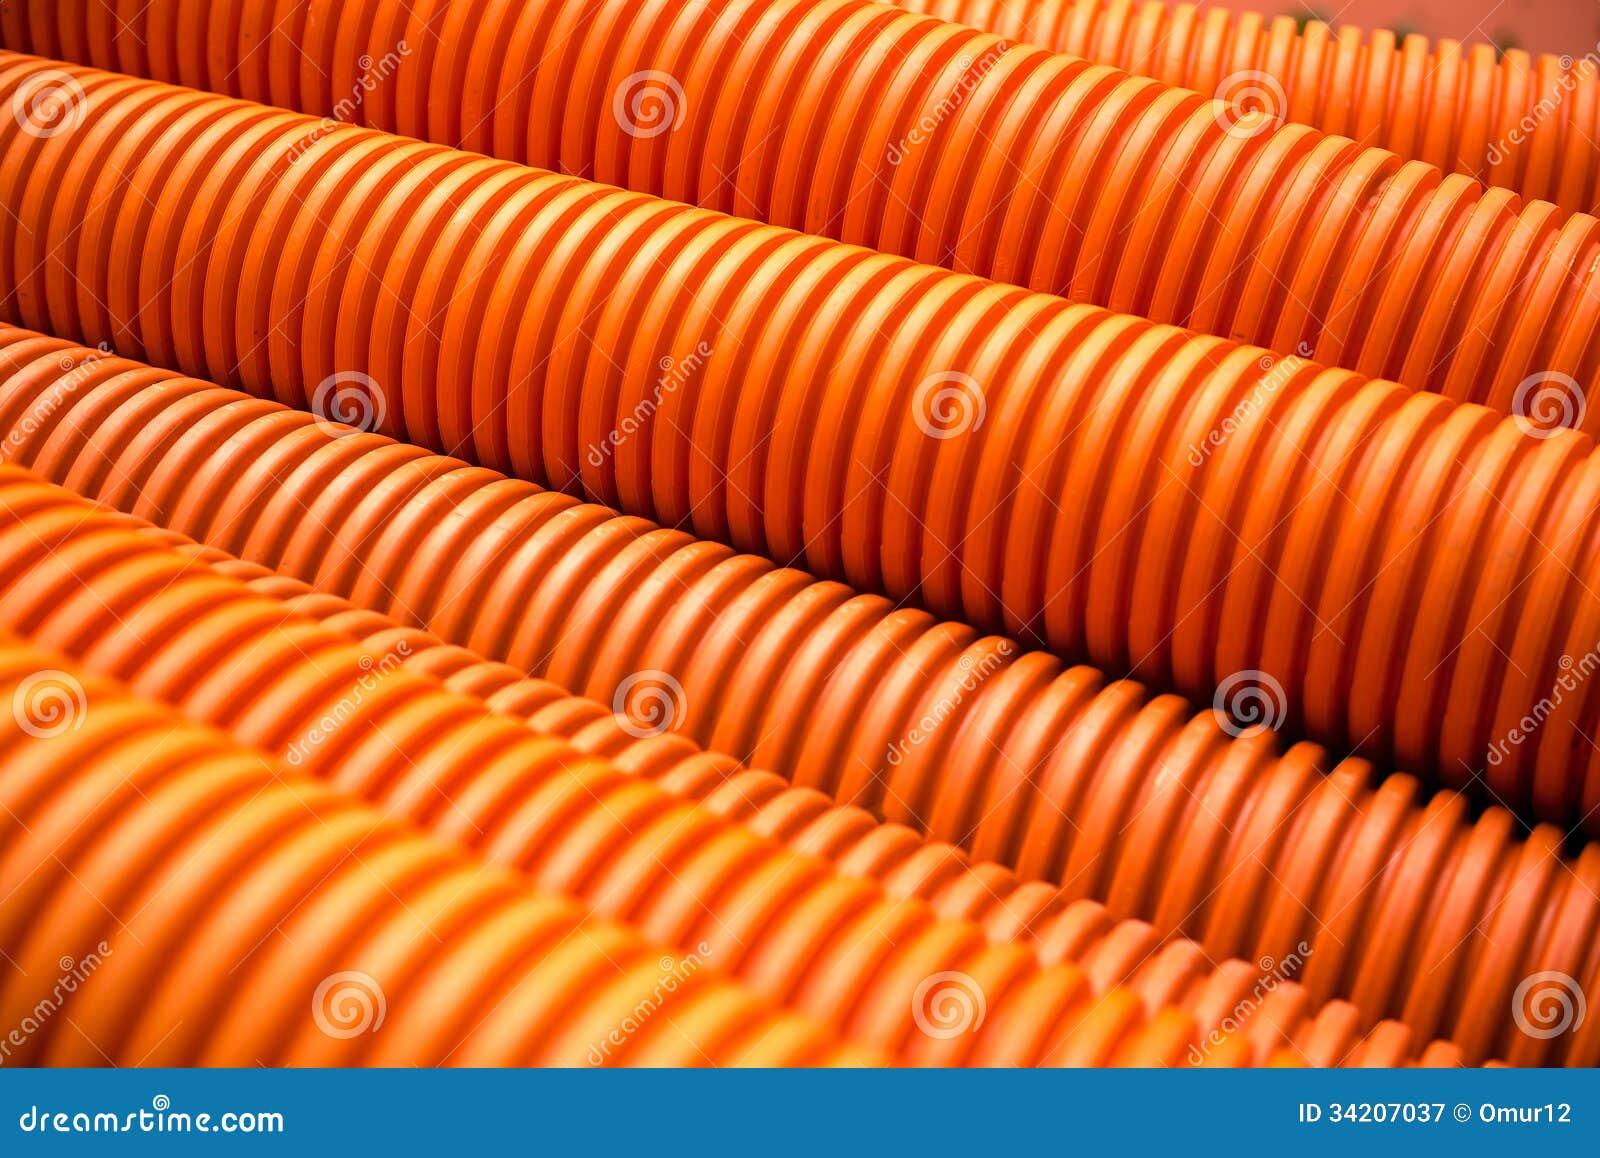 orange plastik pvc rohre auf industriellem stockbild bild 34207037. Black Bedroom Furniture Sets. Home Design Ideas